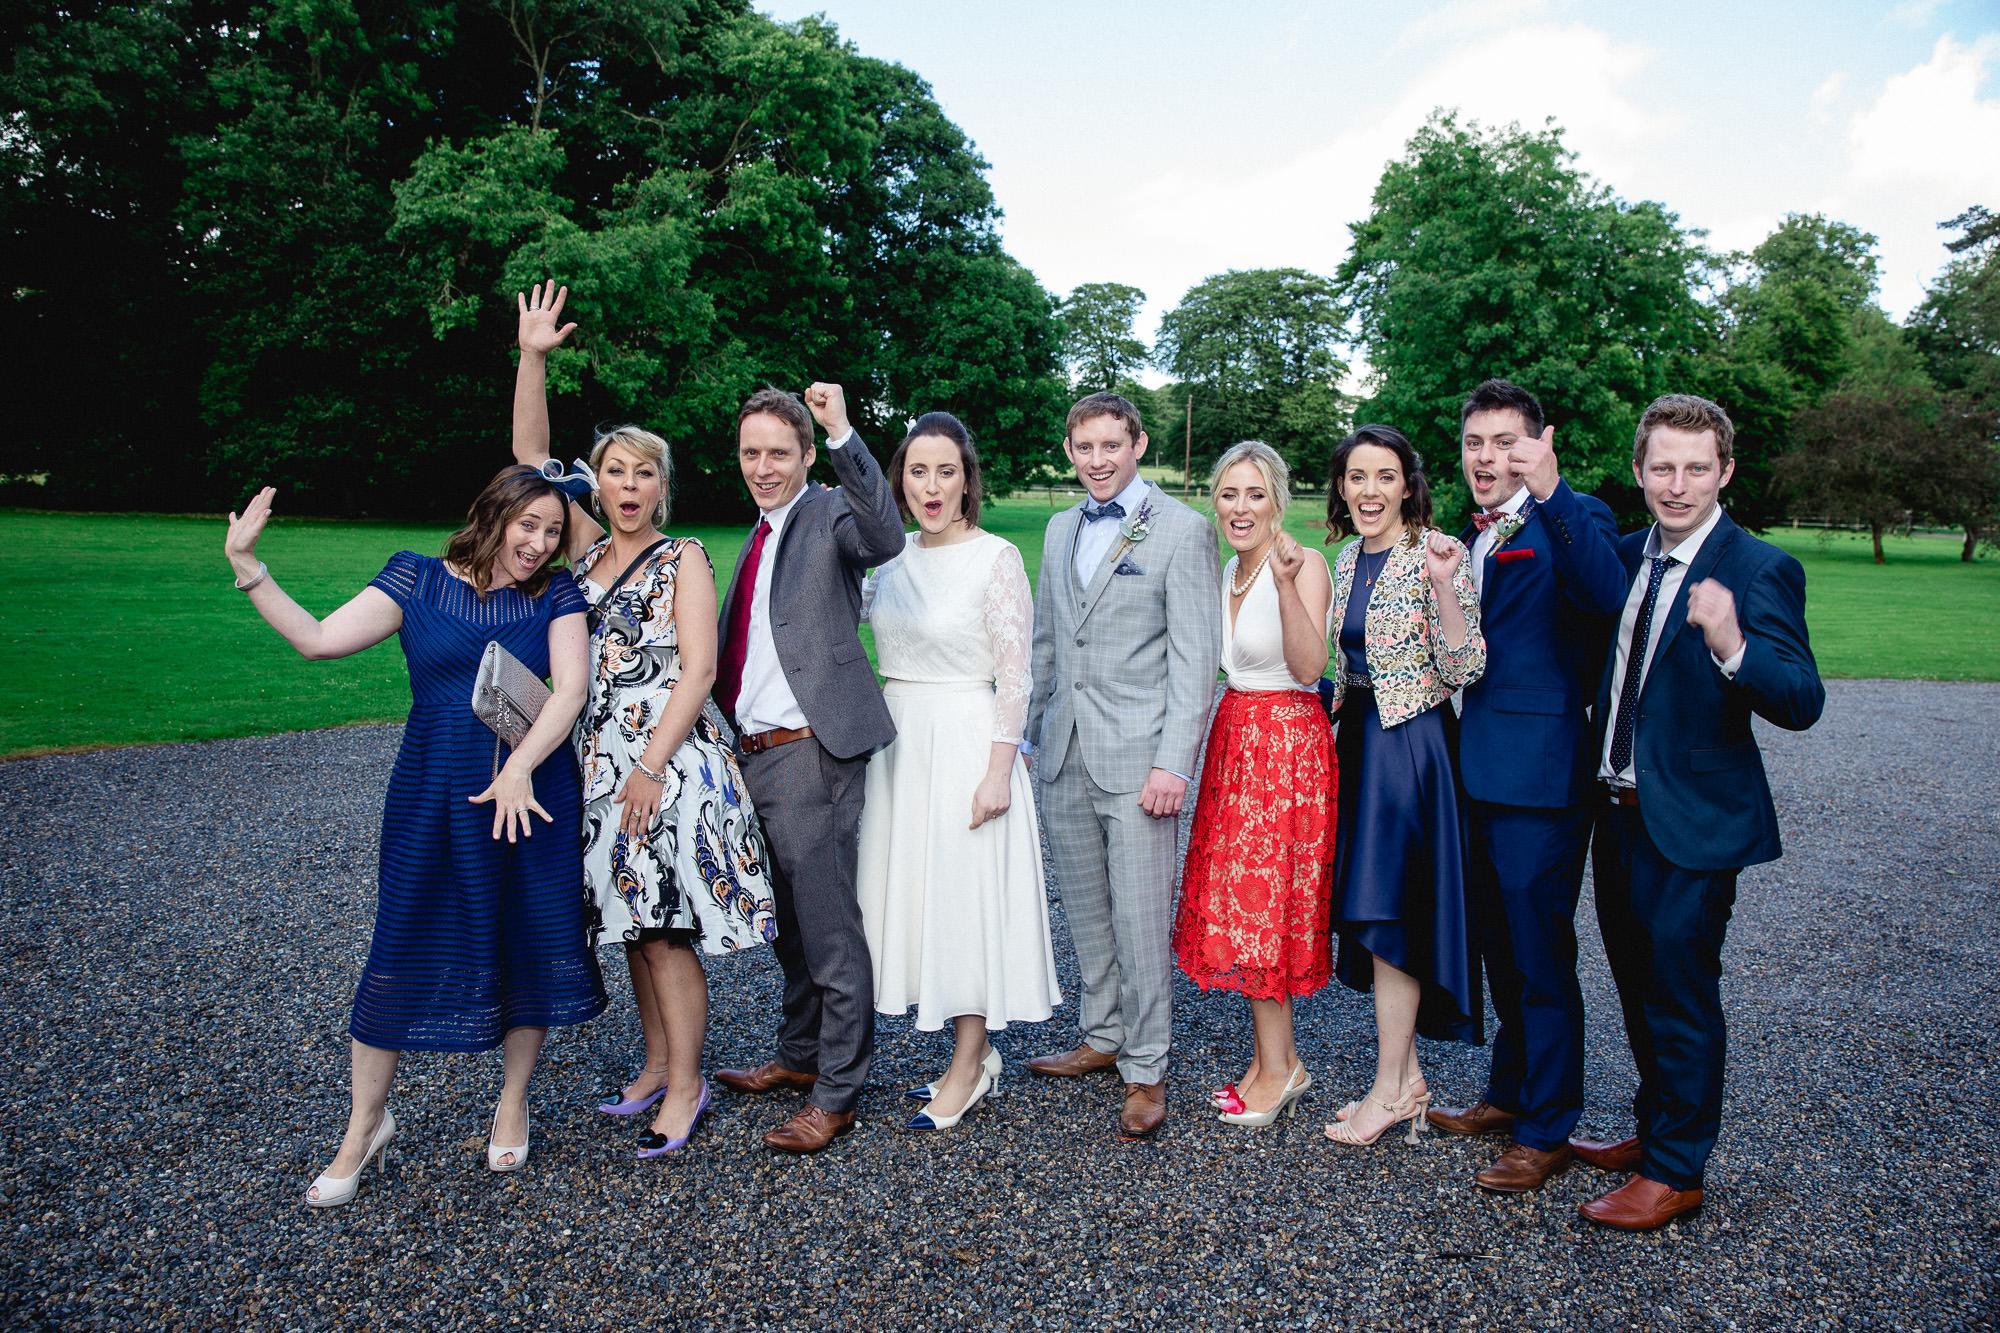 CLAIREBYRNEPHOTOGRAPHY-WEDDING-Ireland-cloncody-alternative-fun-Jen-Helena-21.jpg